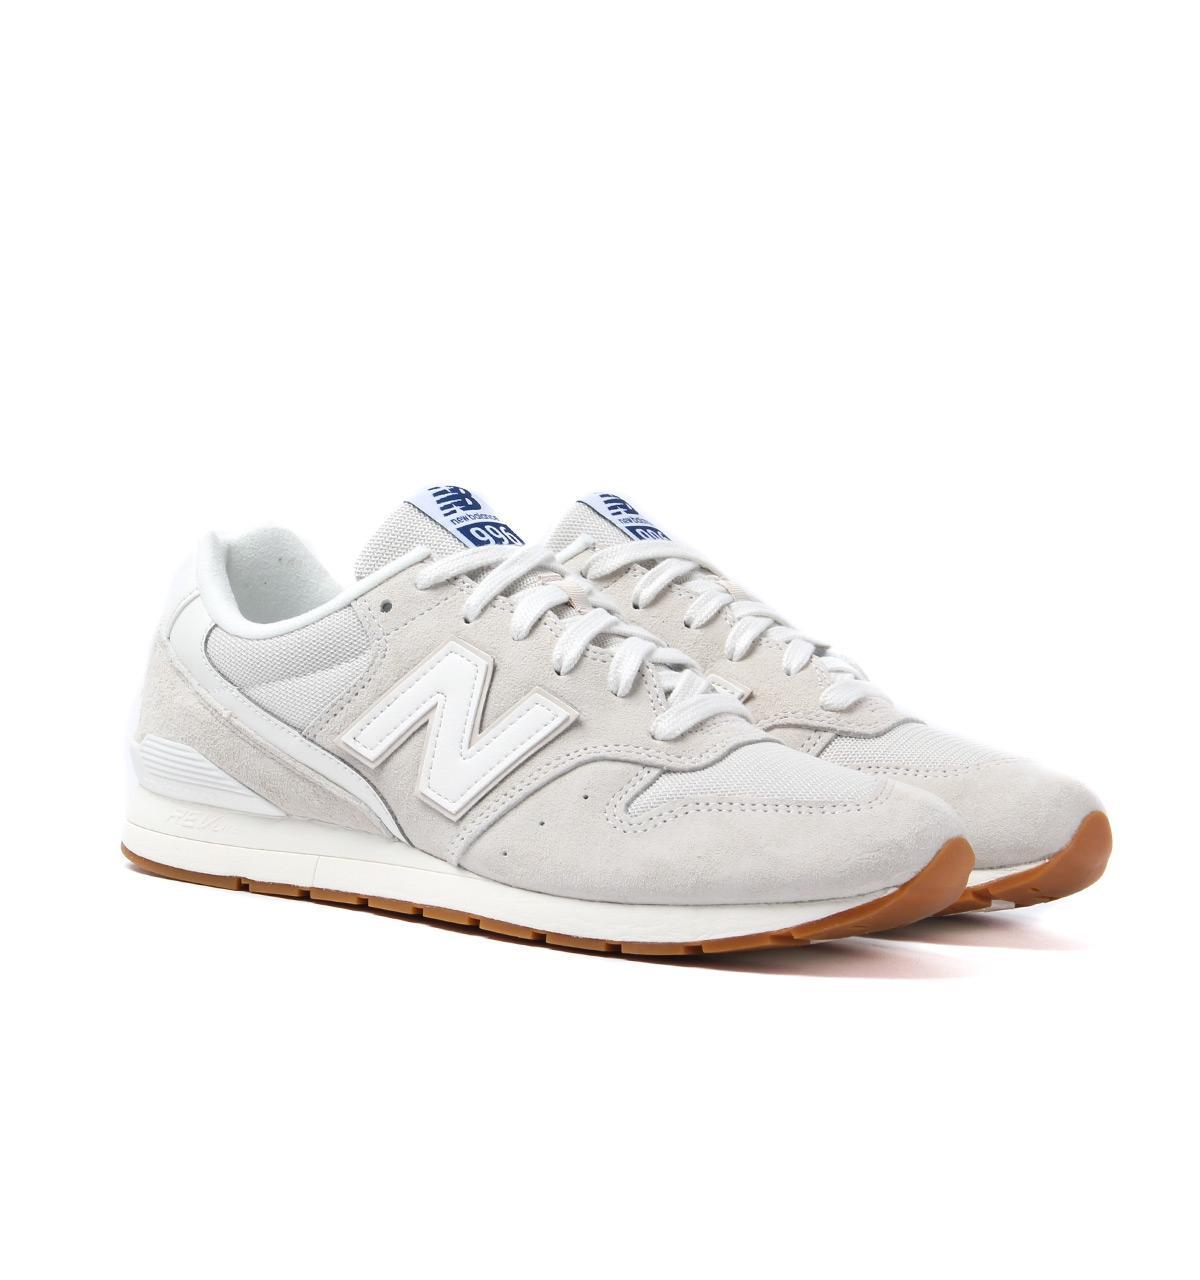 new balance 996 grey mens trainers